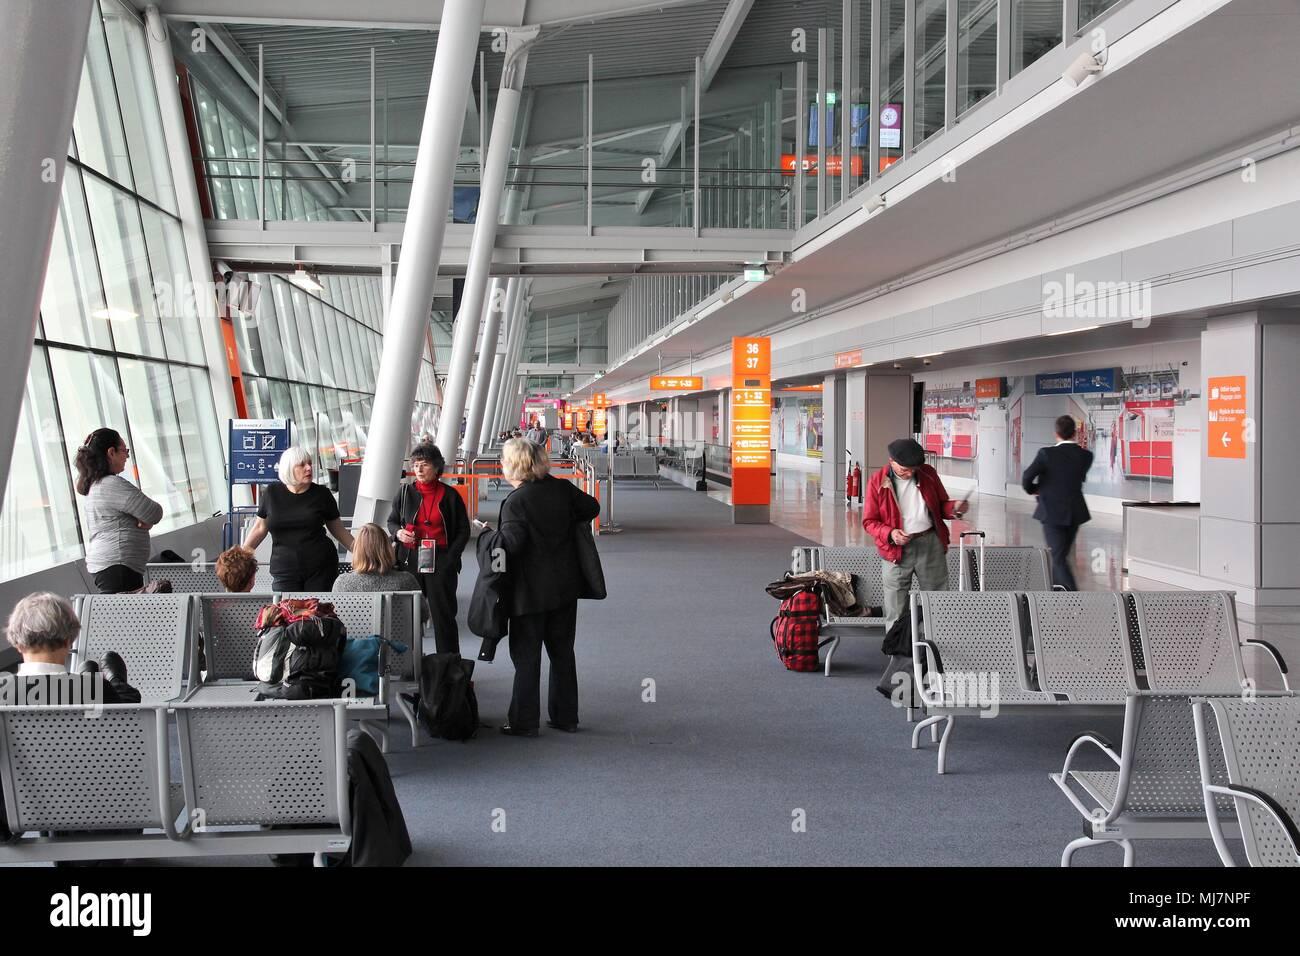 Aeroporto Waw : Poland chopin airport waw terminal stock photos & poland chopin